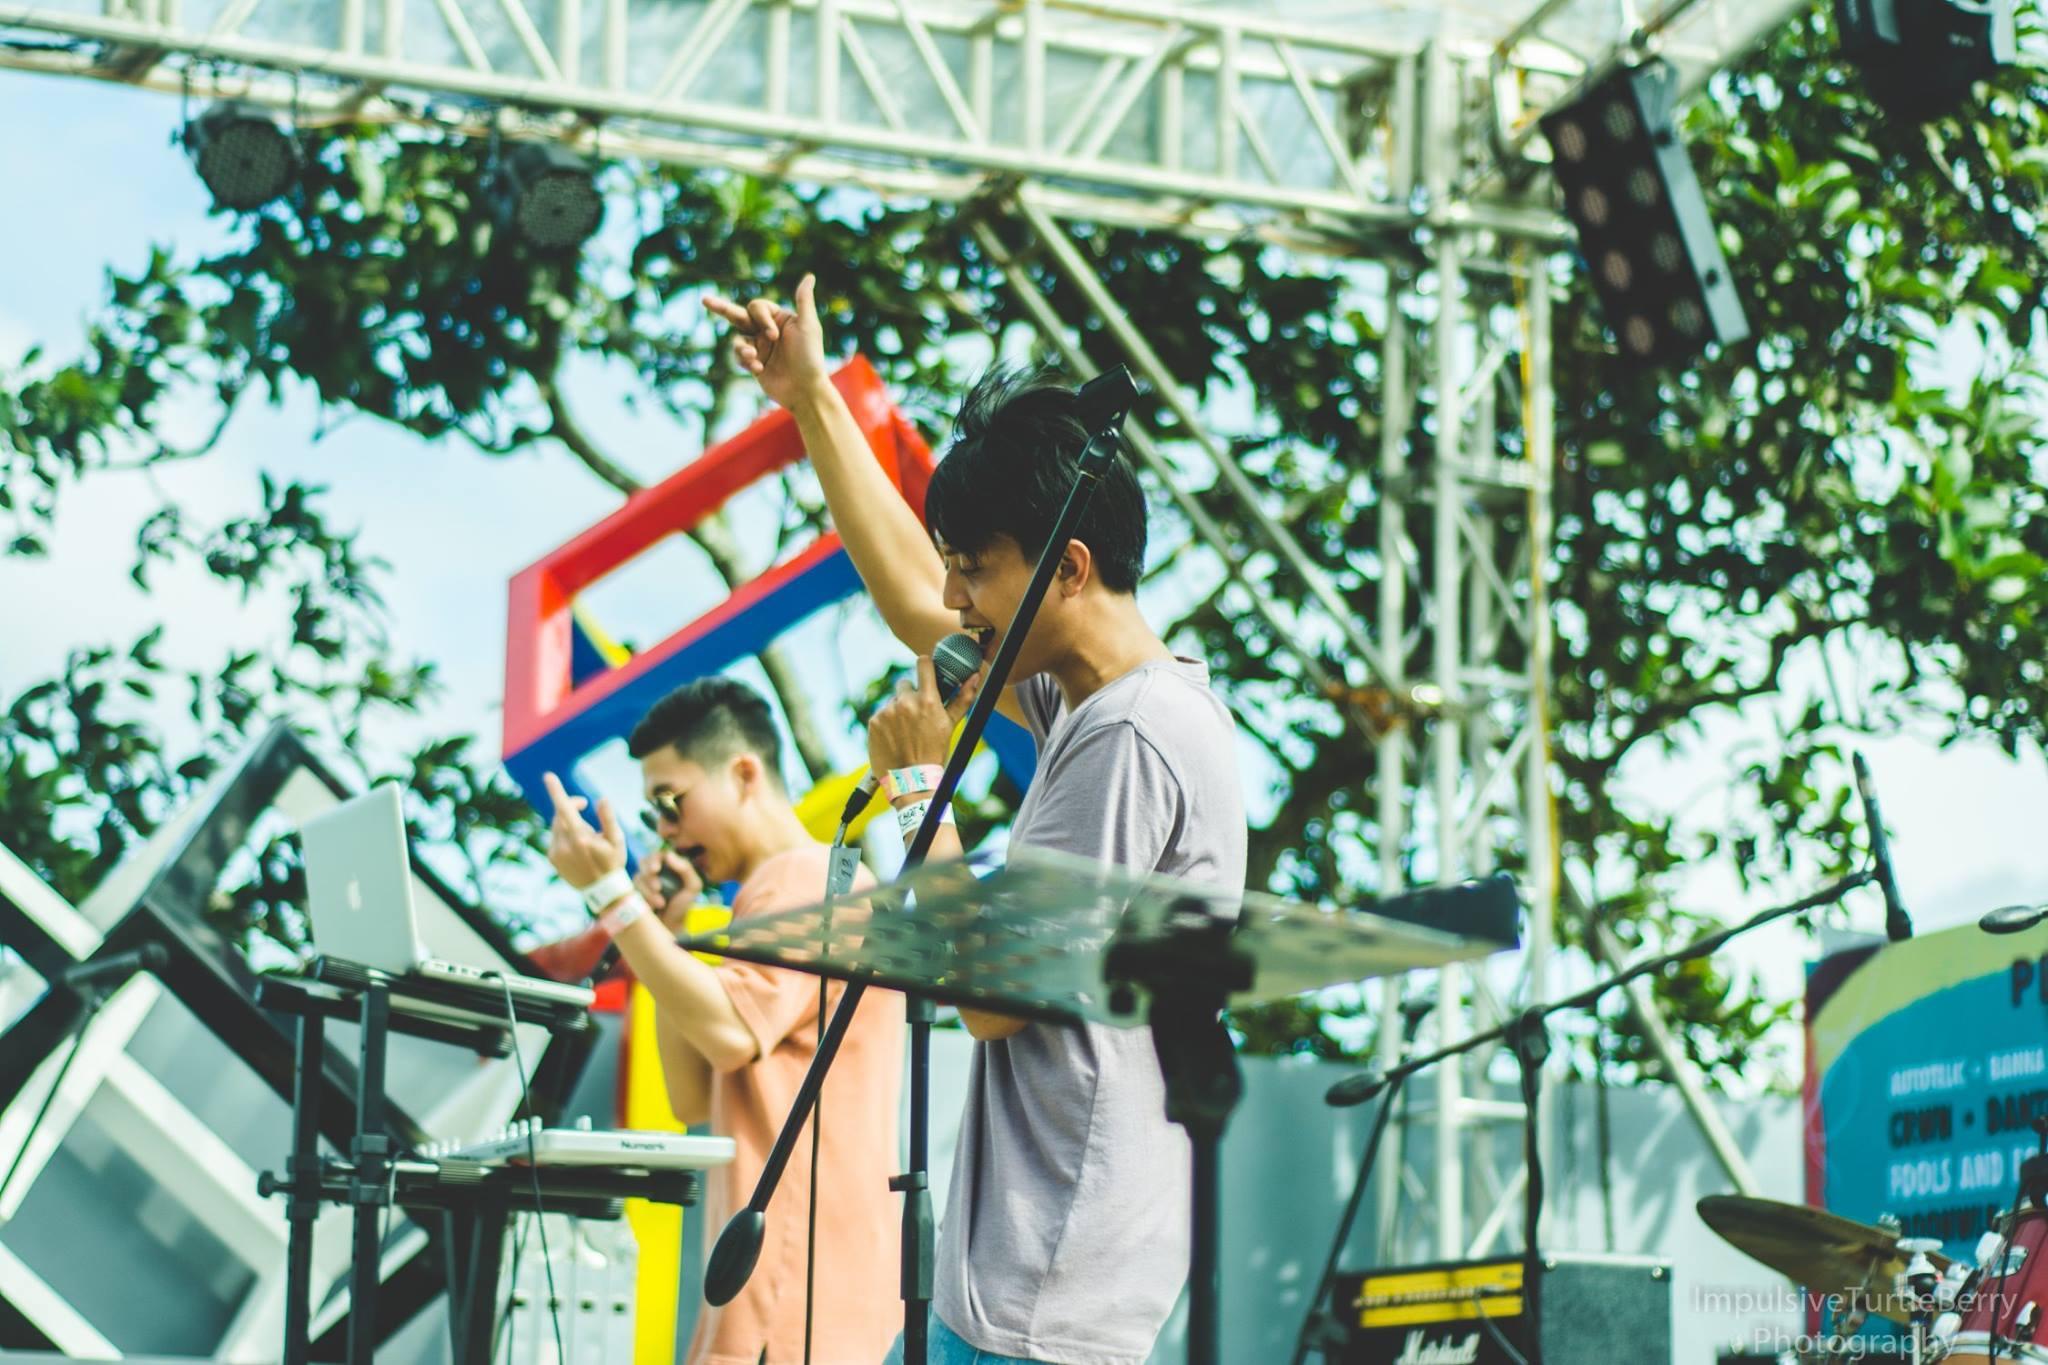 Dante & Amigo's debut EP, 'Easy' tops iTunes Philippines hip-hop album releases